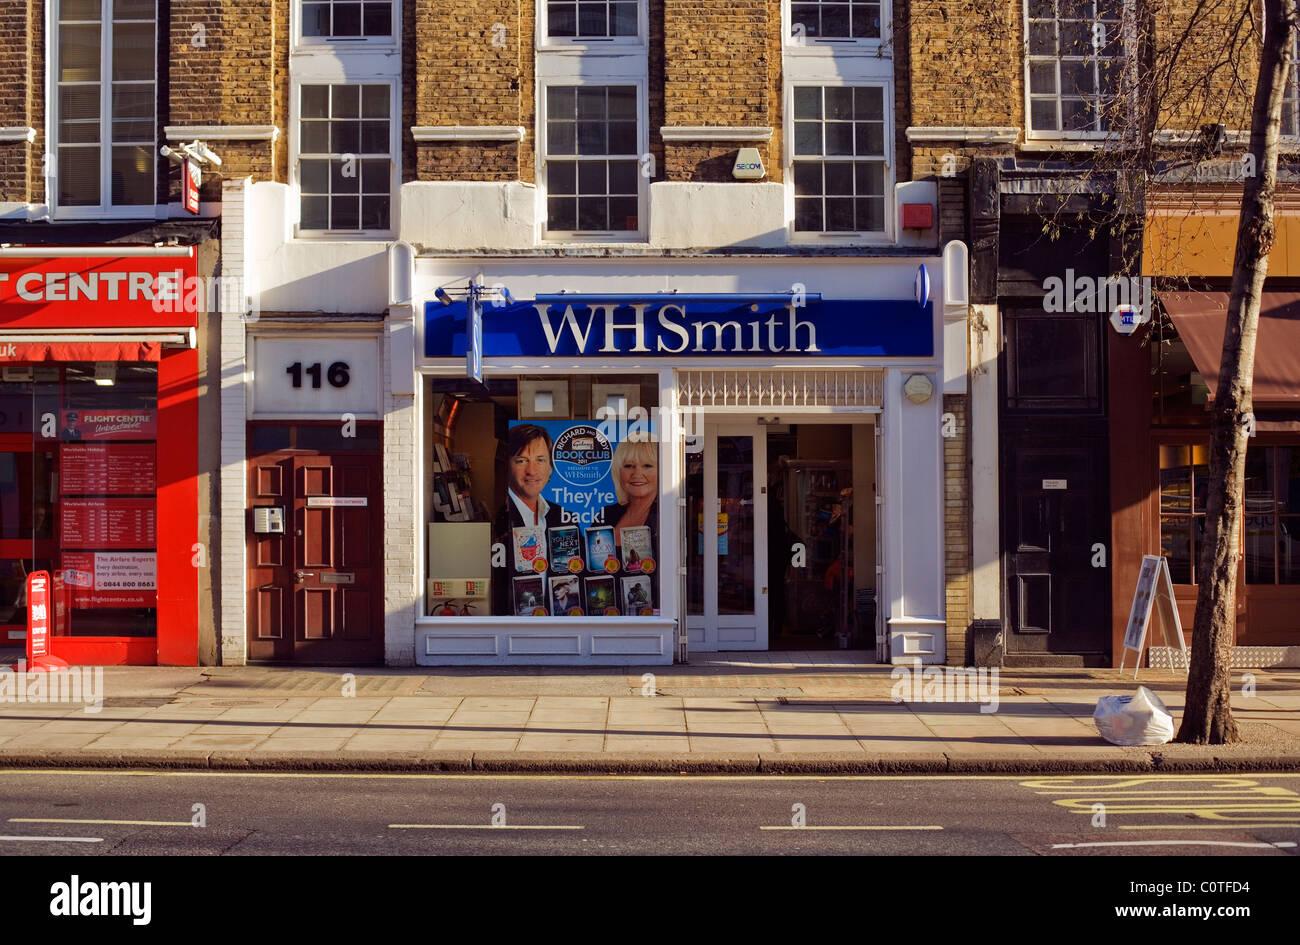 WH Smith, newsagents, shops, Baker Street, London, England, UK, Europe - Stock Image